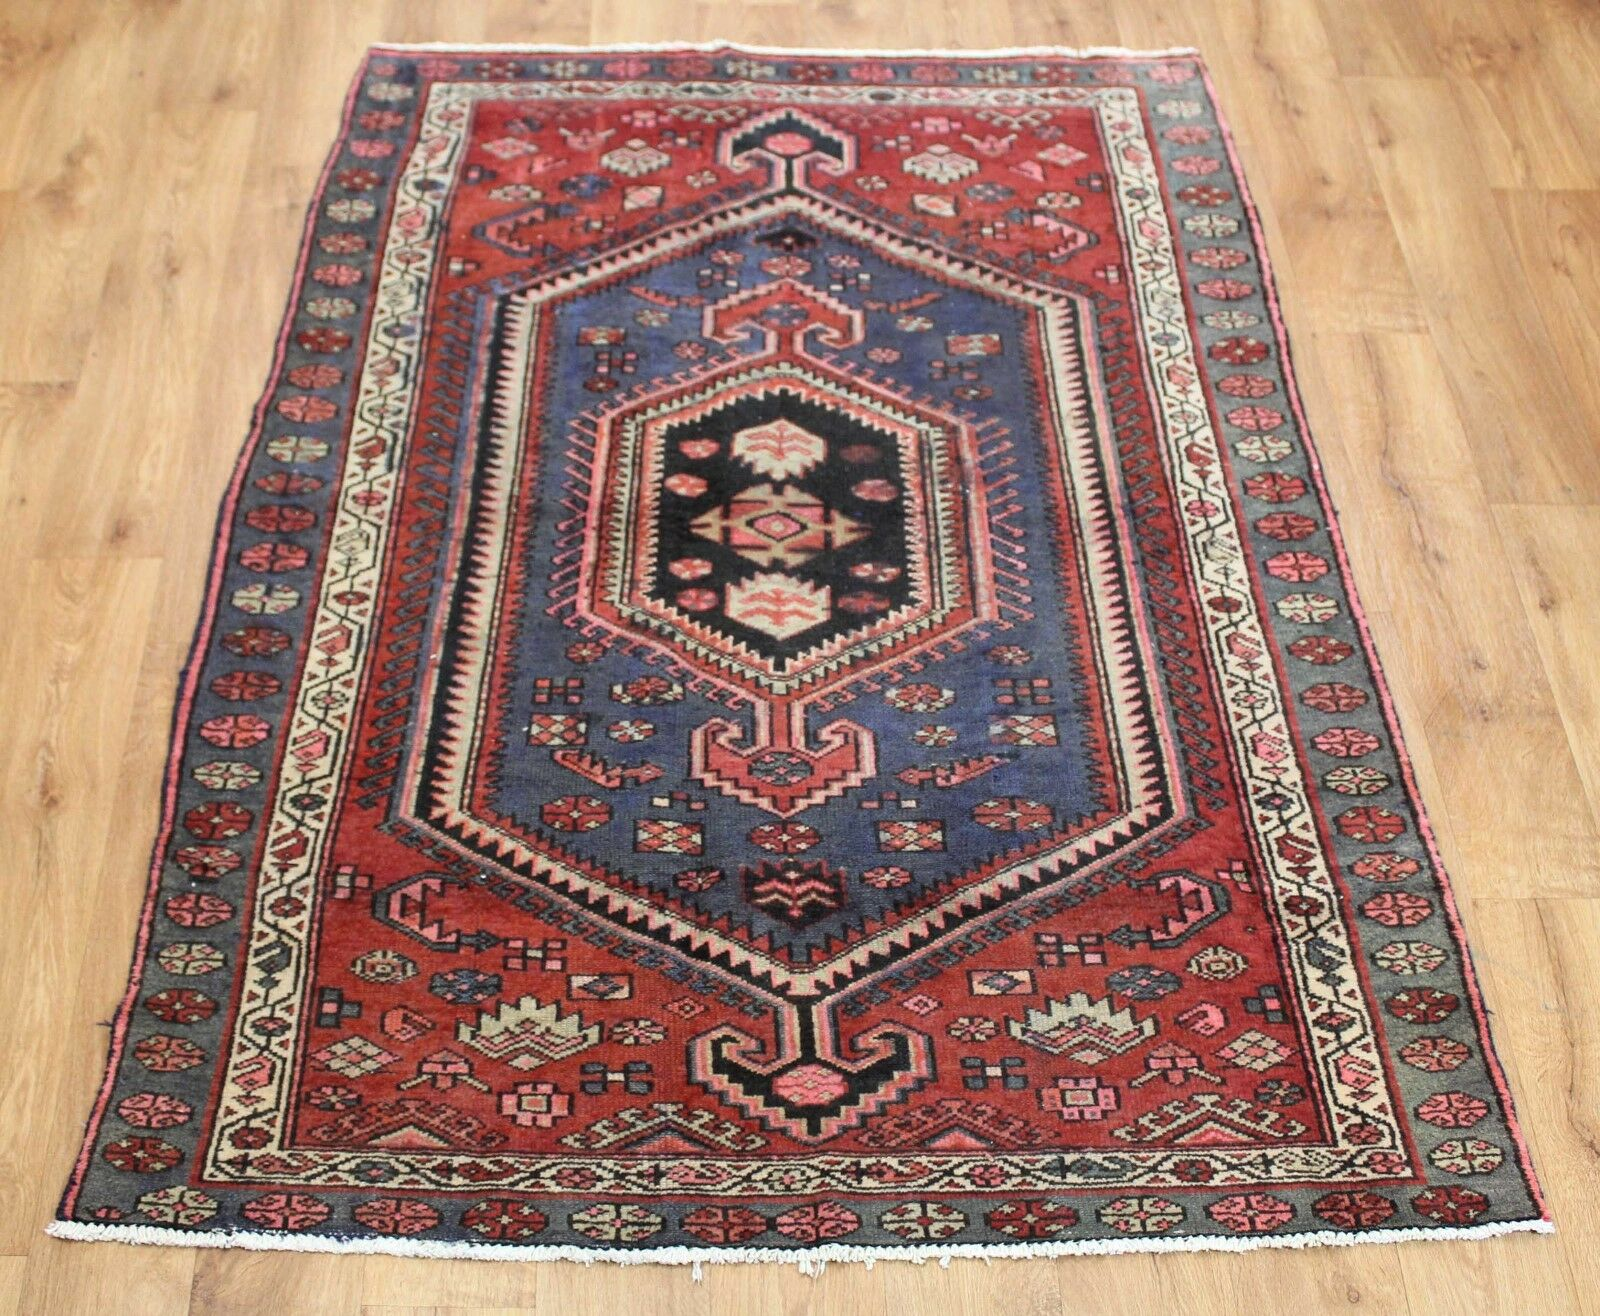 Traditional Vintage Wool Handmade Classic Oriental Area Rug Carpet 210 210 210 X 125 cm 30c3f0